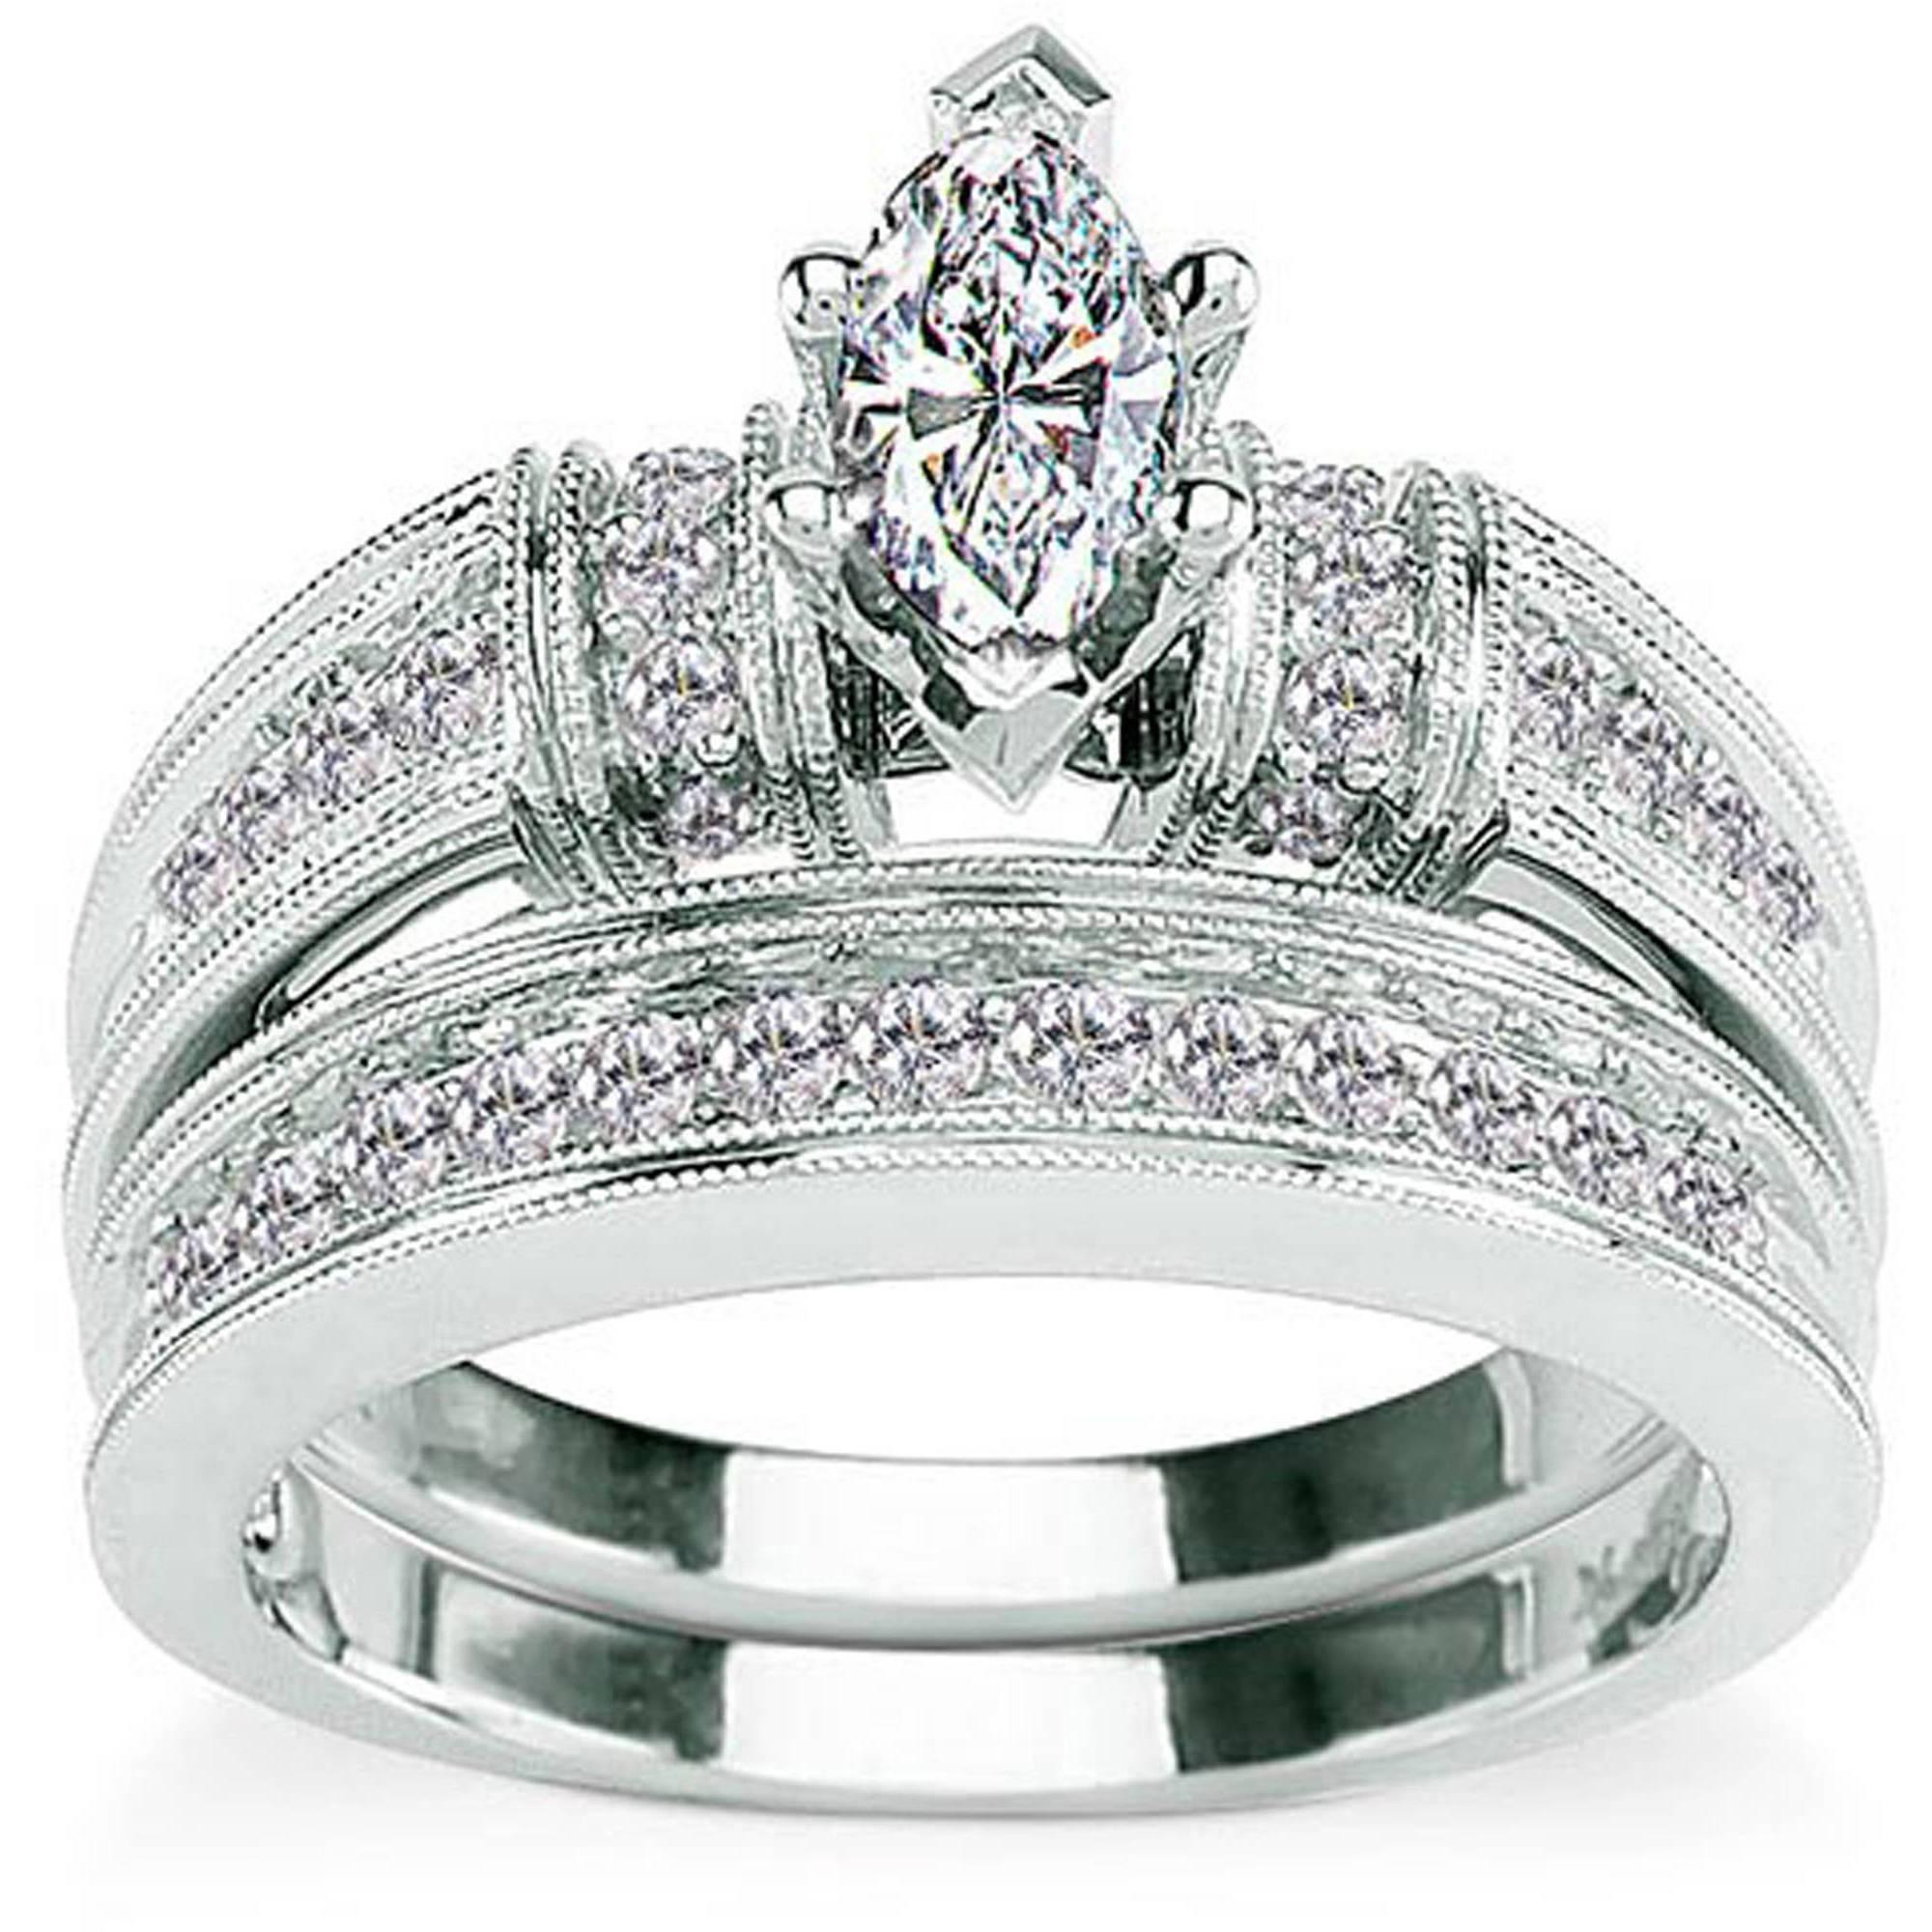 Amazing 3.3 Carat T.g.w. Cz 14Kt Gold Plated Wedding Ring Set U2013 Walmart In Walmart  Womens Wedding Design